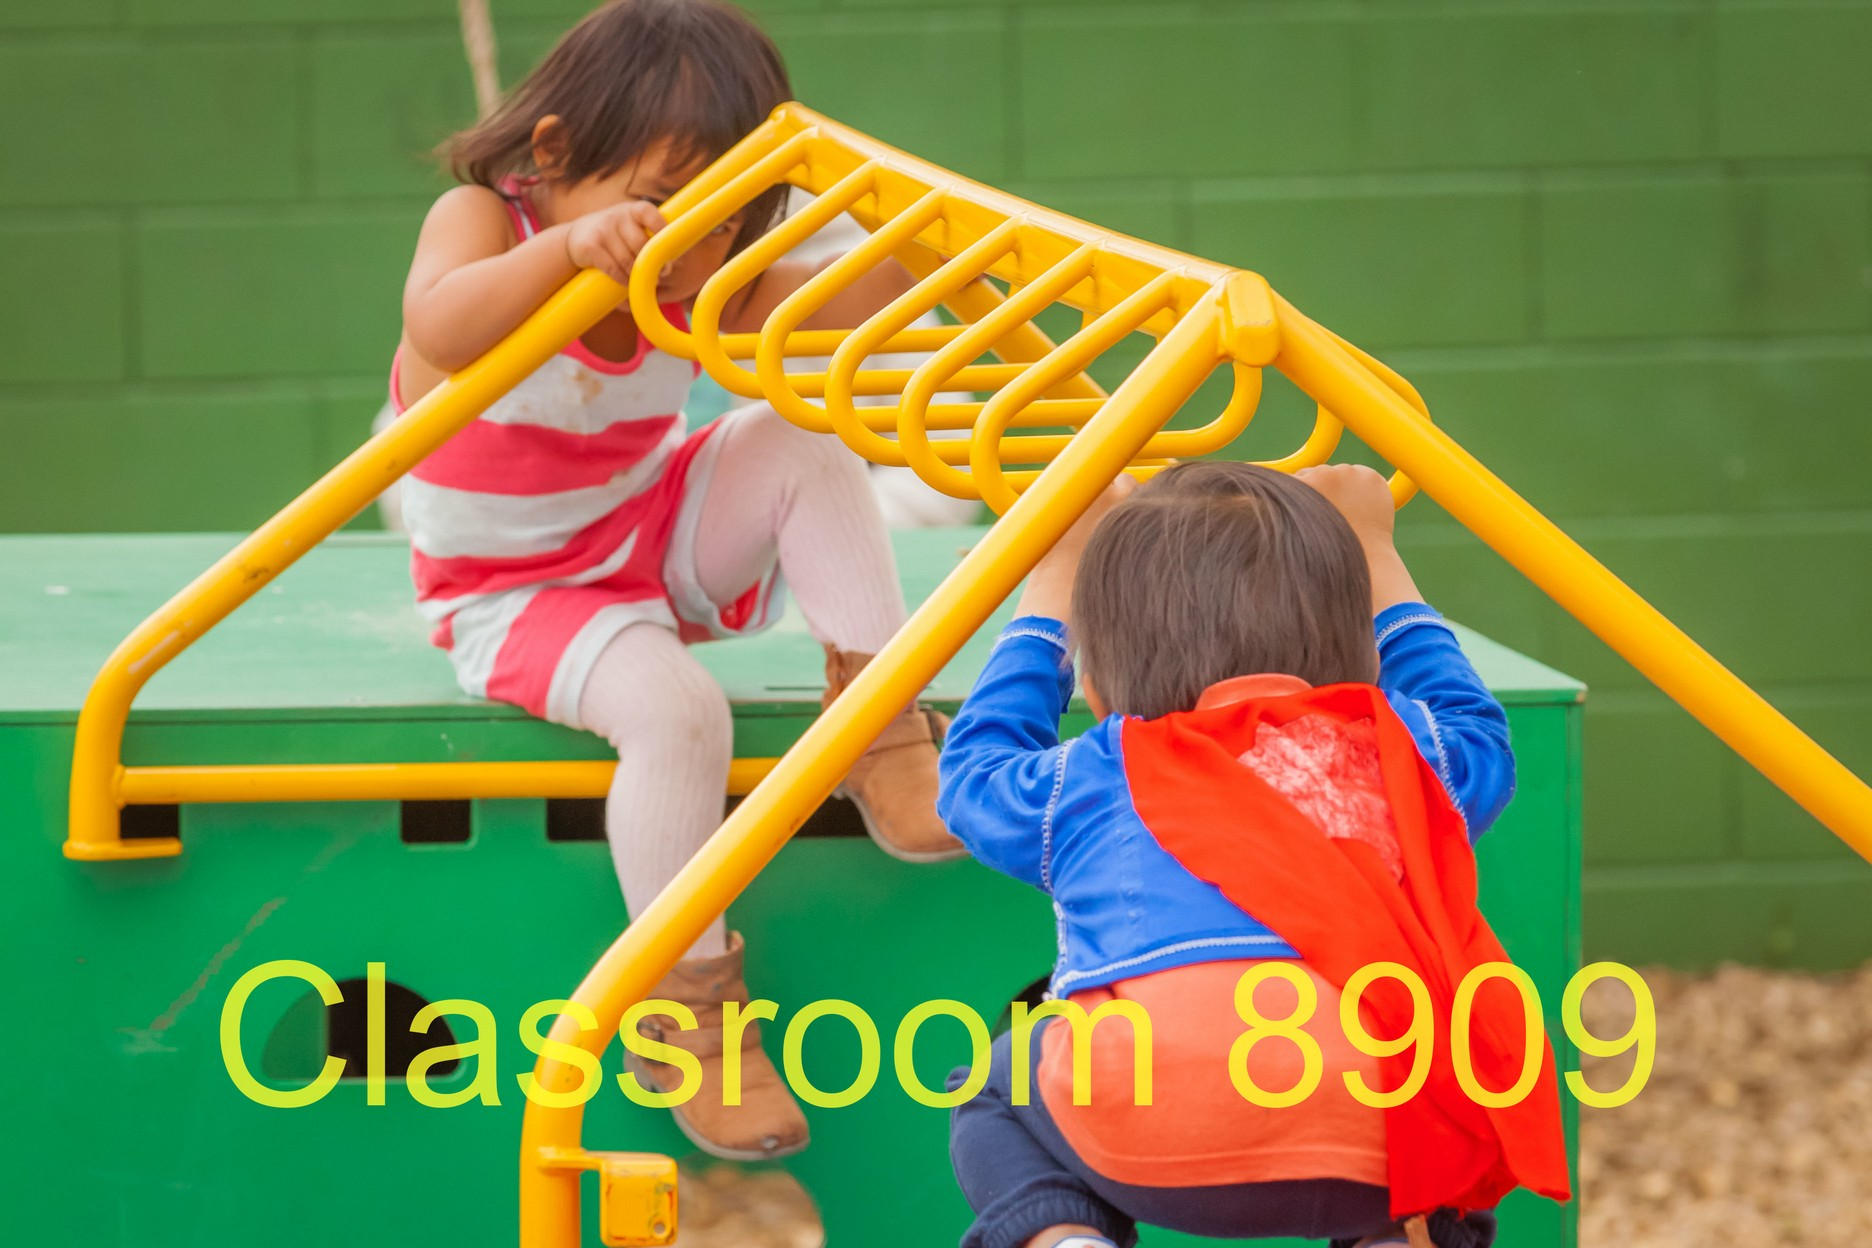 Classroom 8909